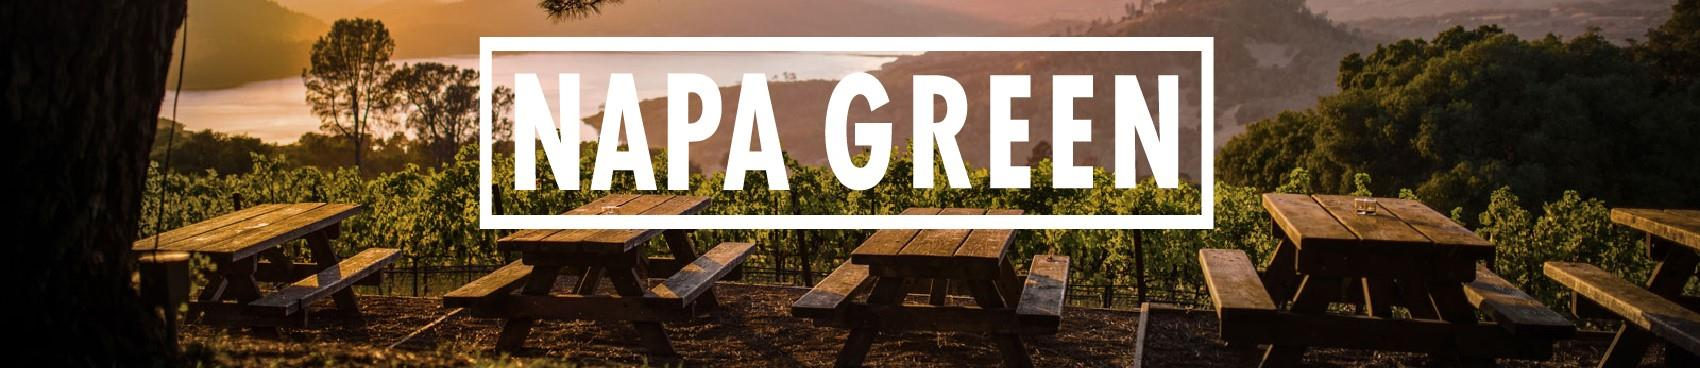 Napa Green